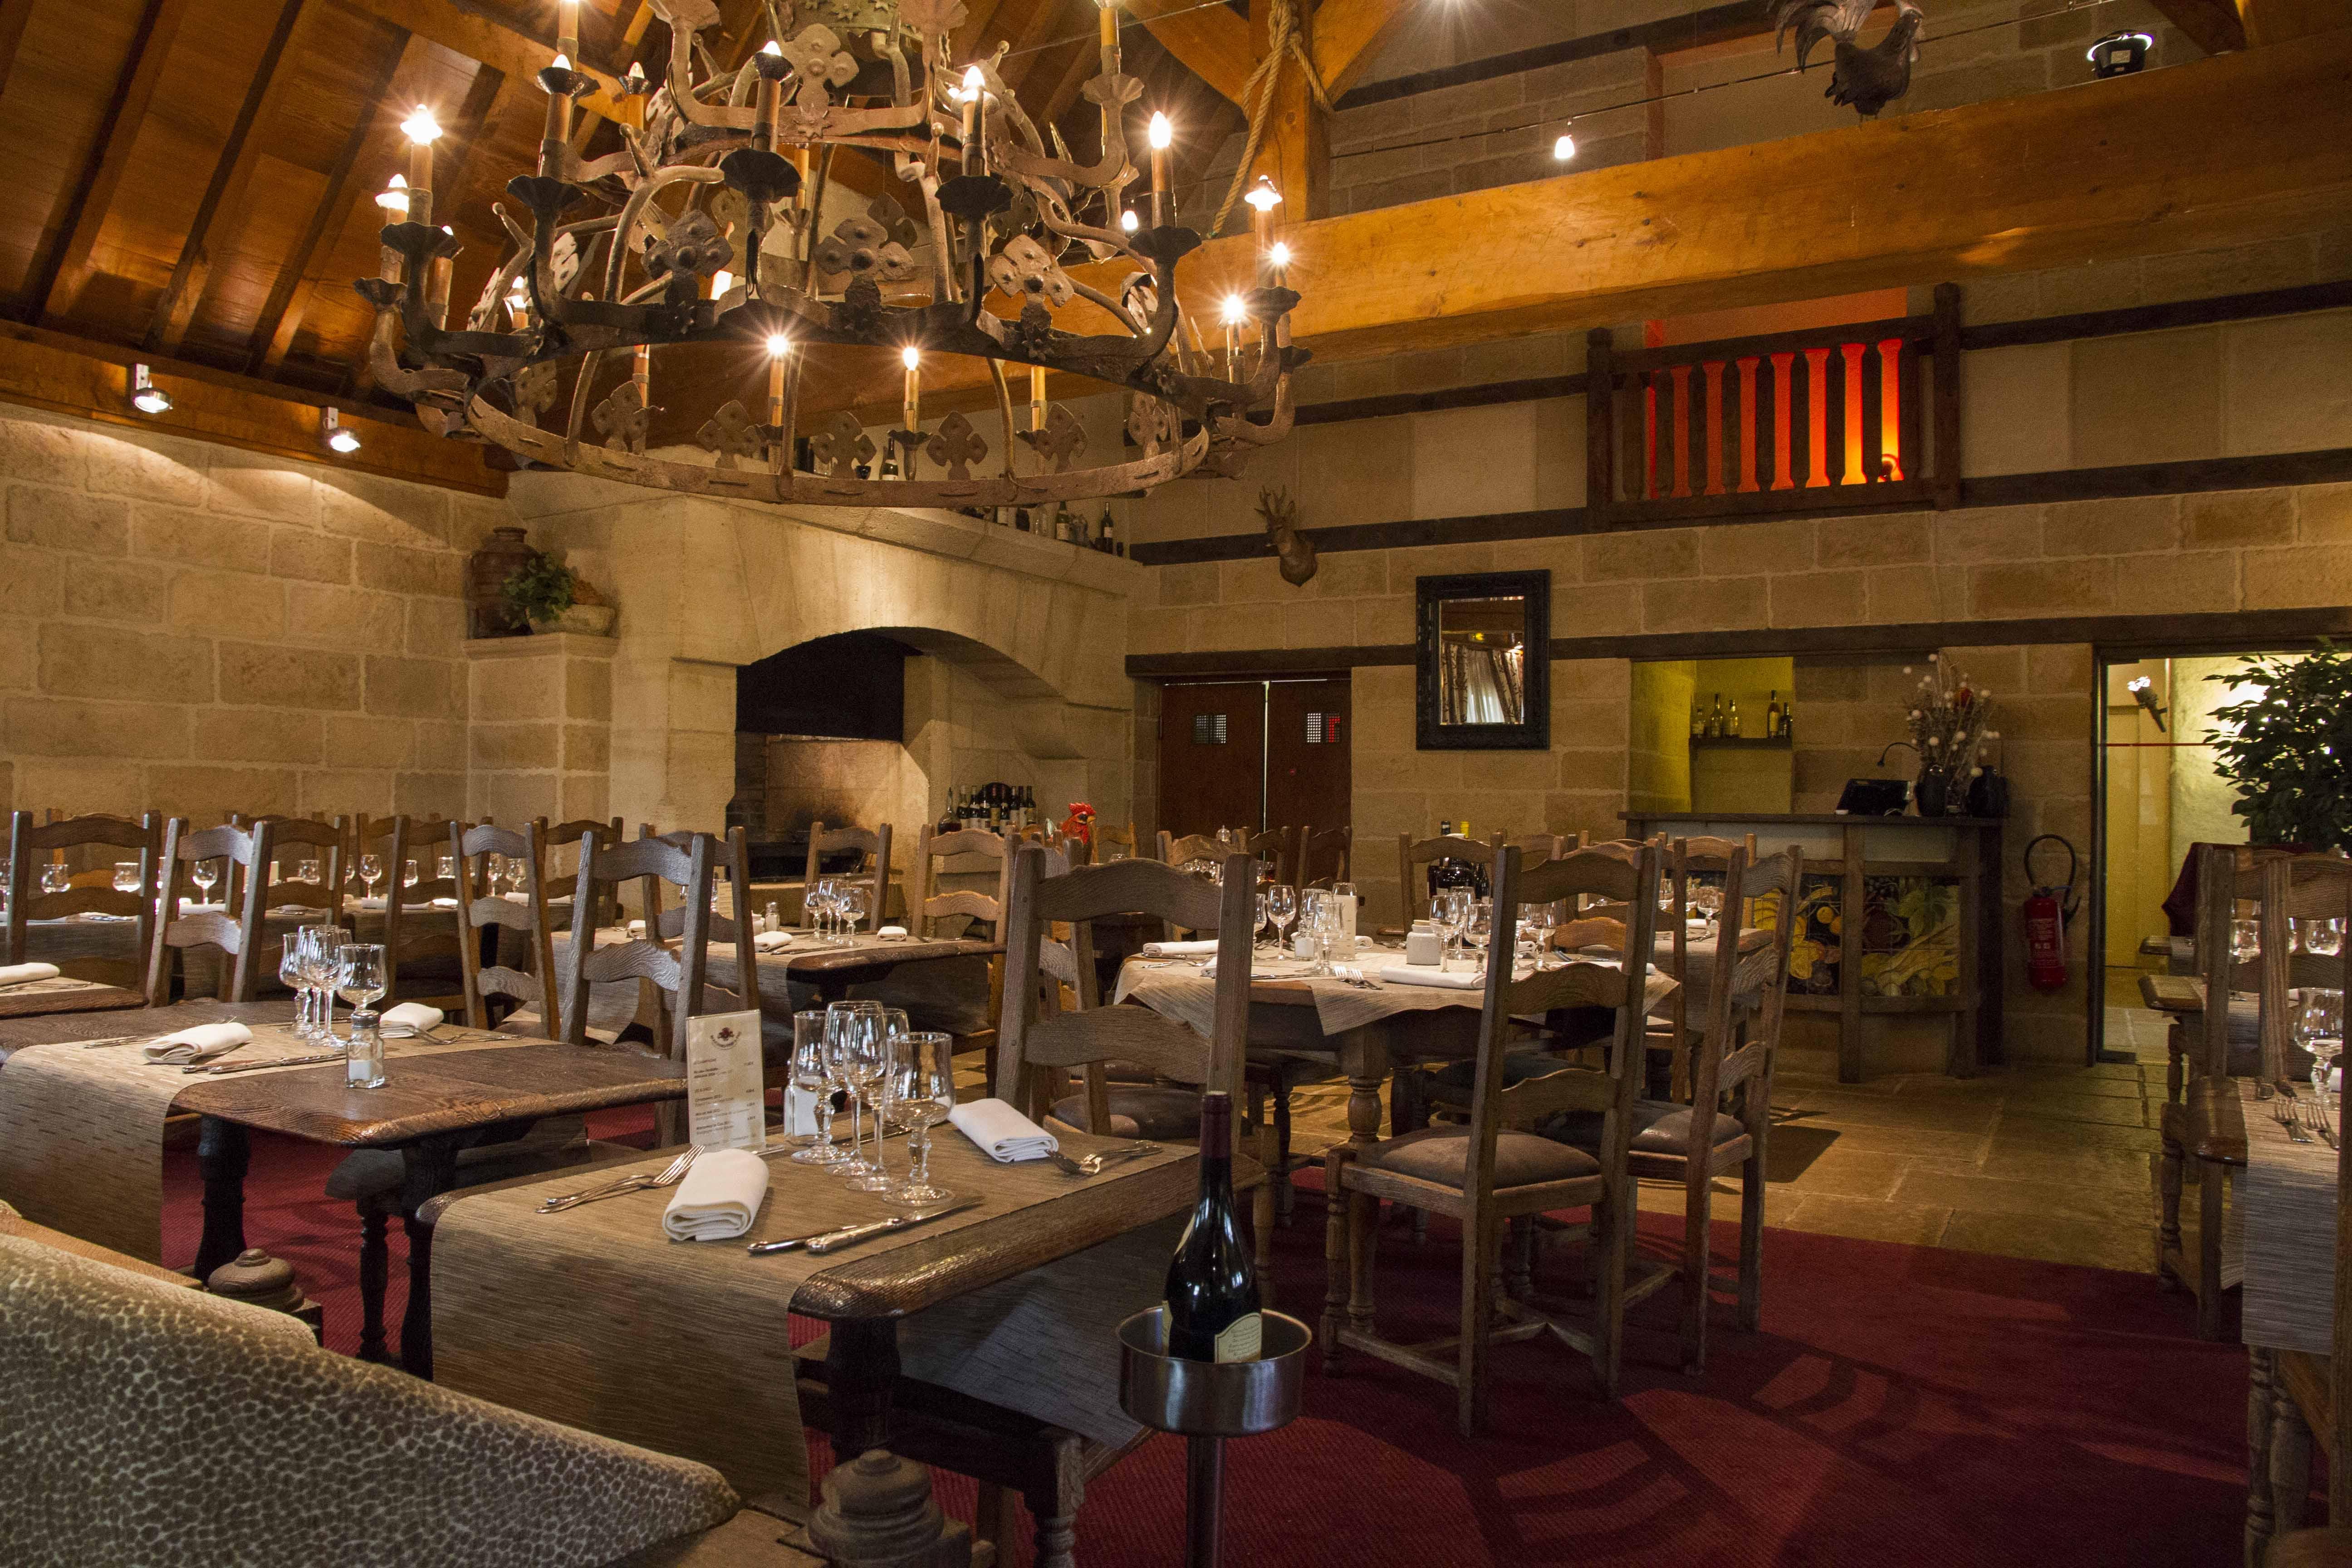 HOTEL RESTAURANT LA FLAMBEE